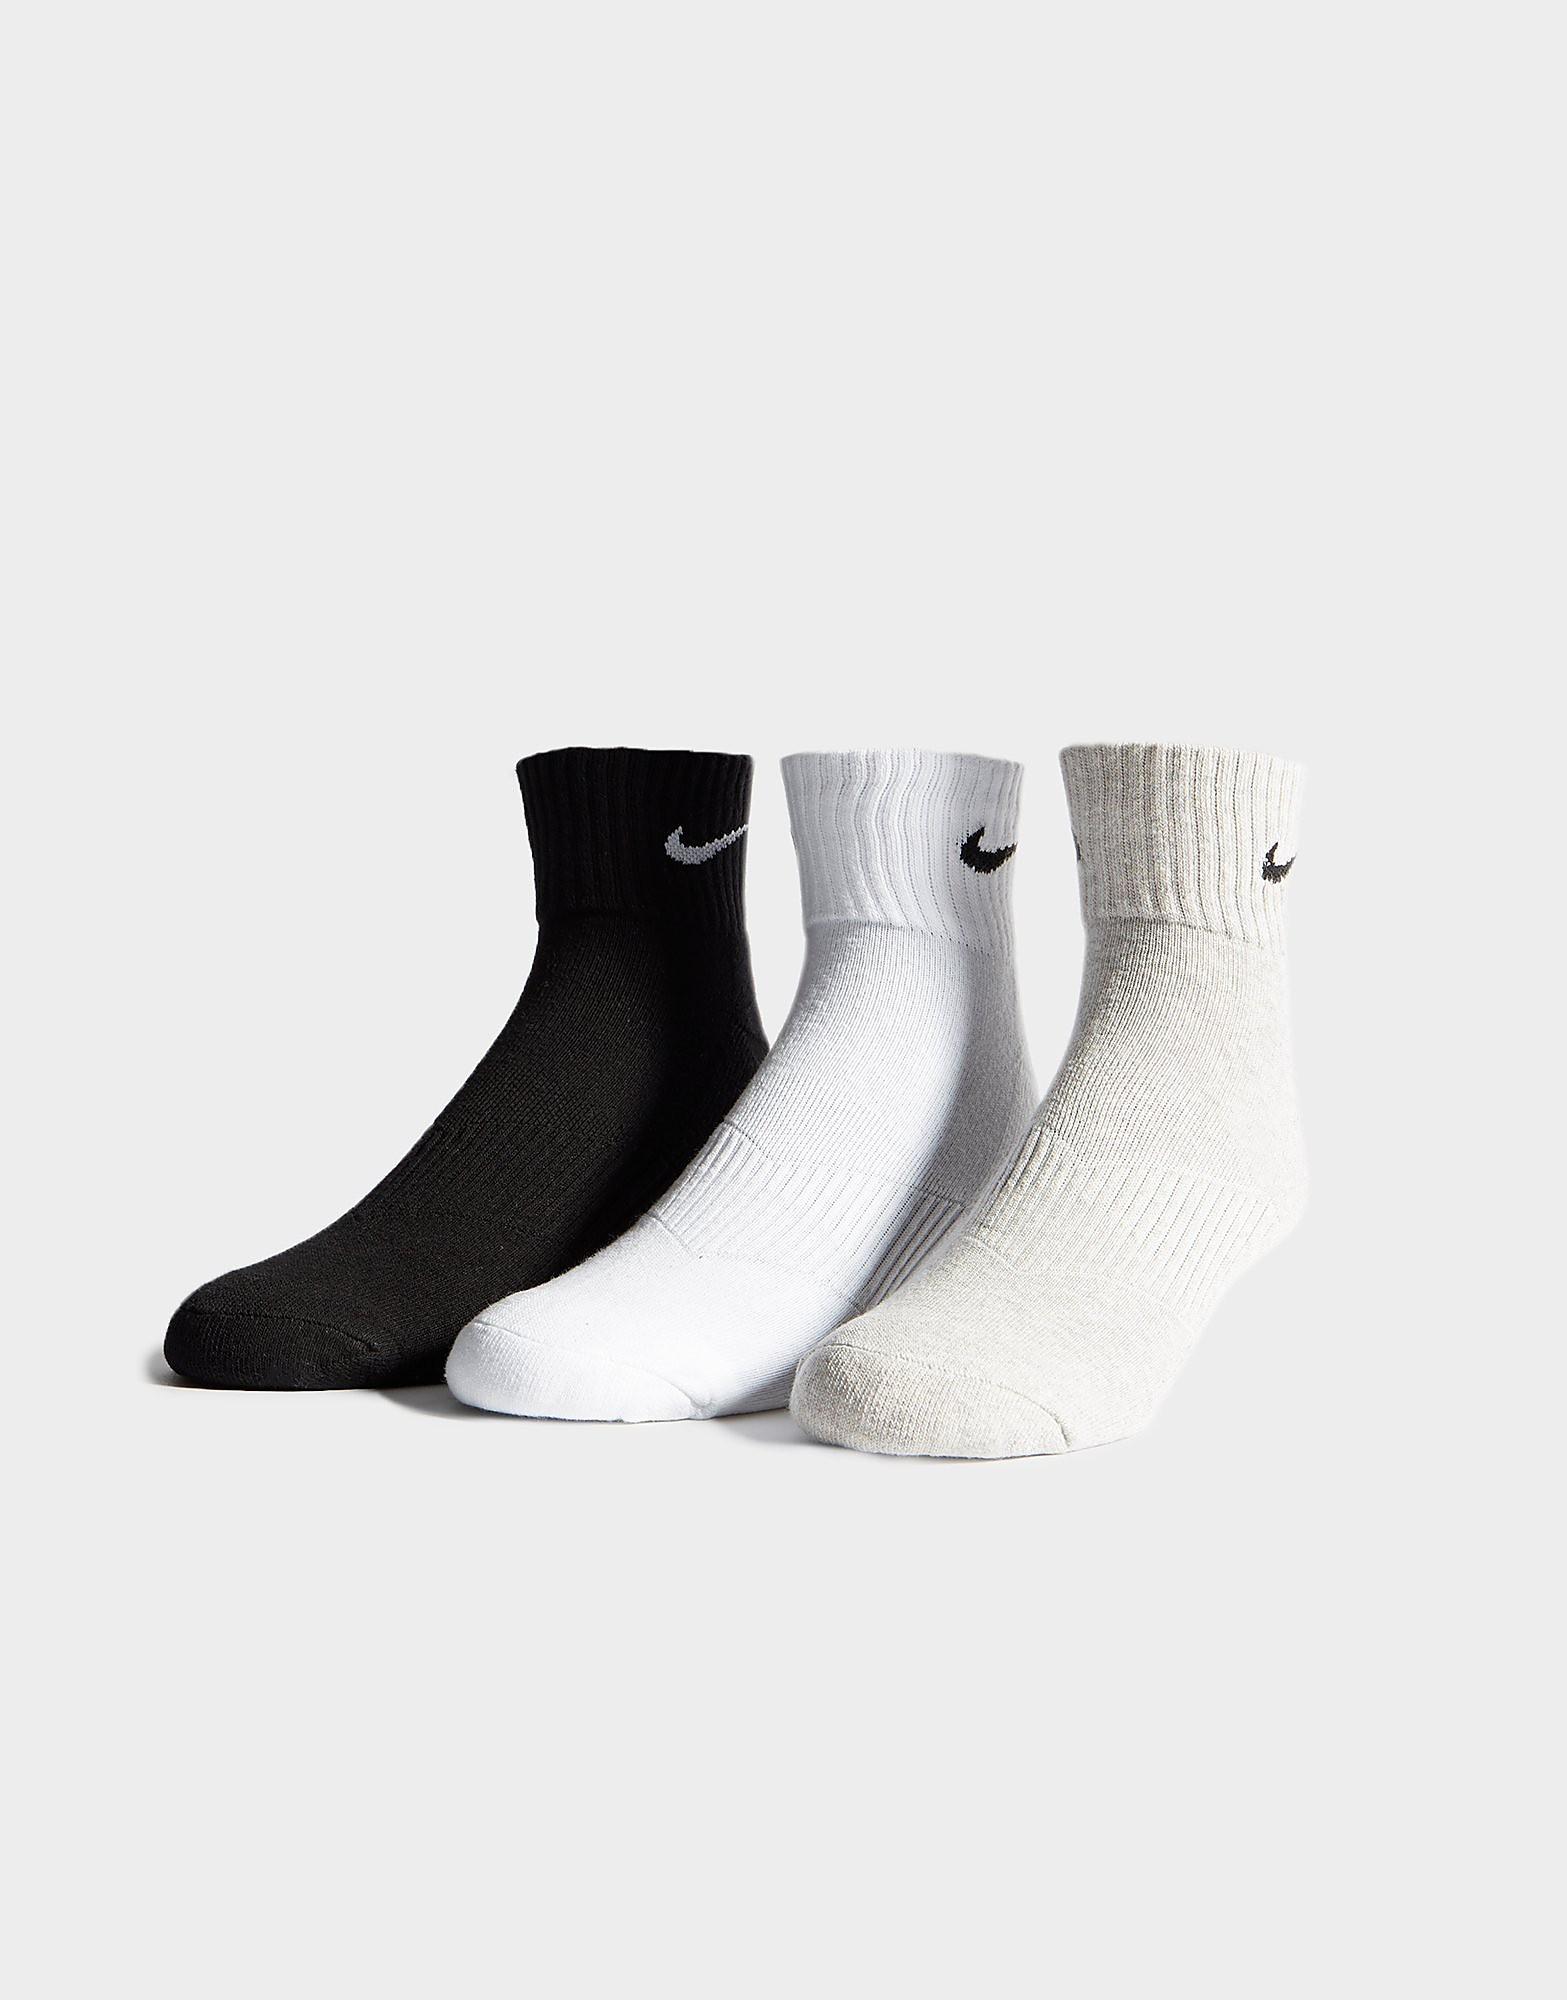 Nike 3 Confezioni di calzini sportivi